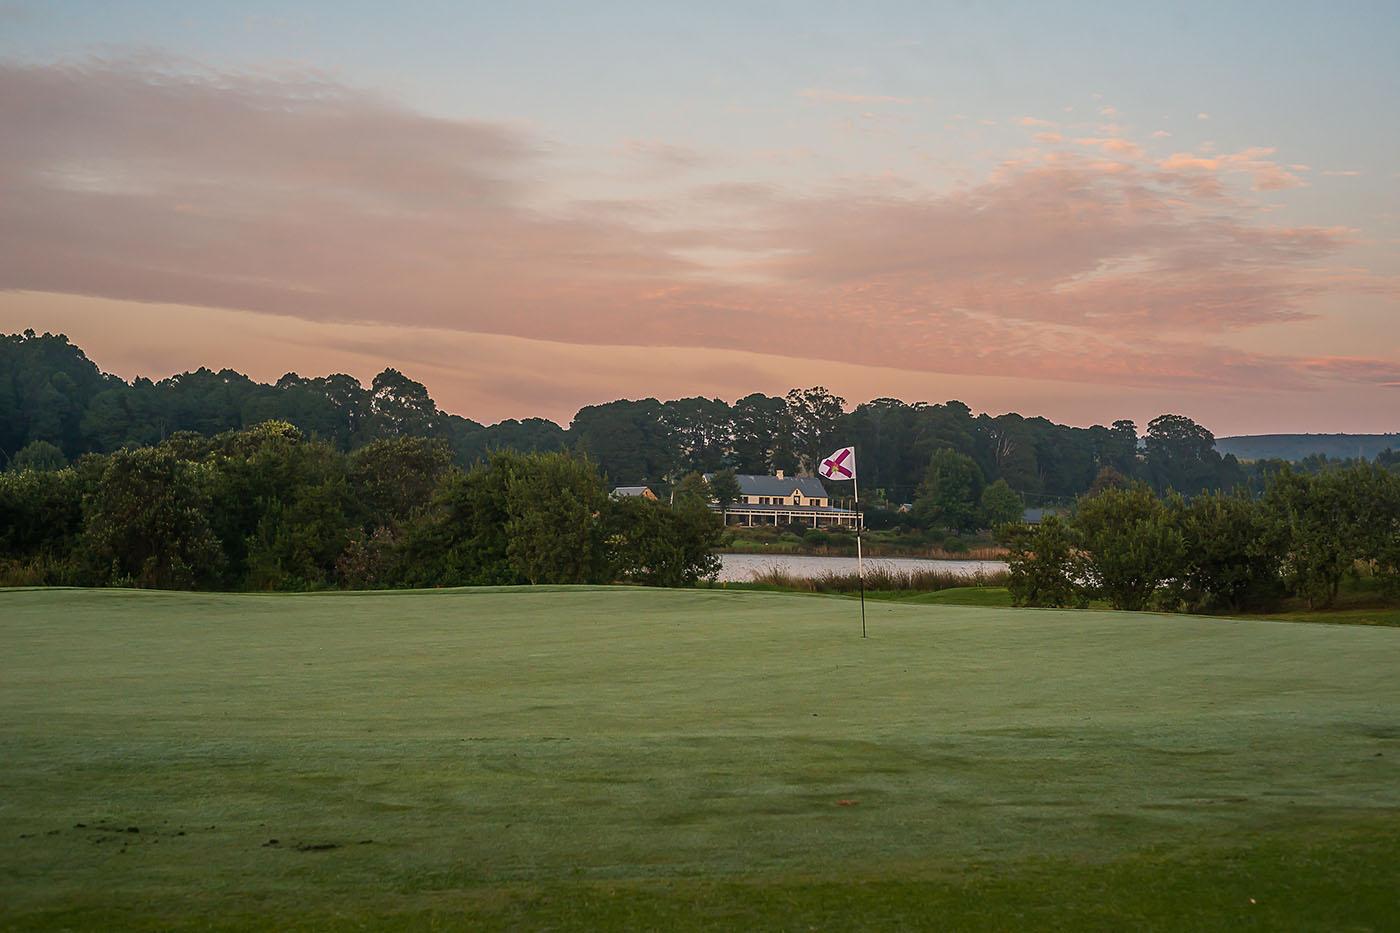 golf-gallery-gowrie-farm-classic-golf-course-Nottingham-Road-midlands-kwazulu-natal